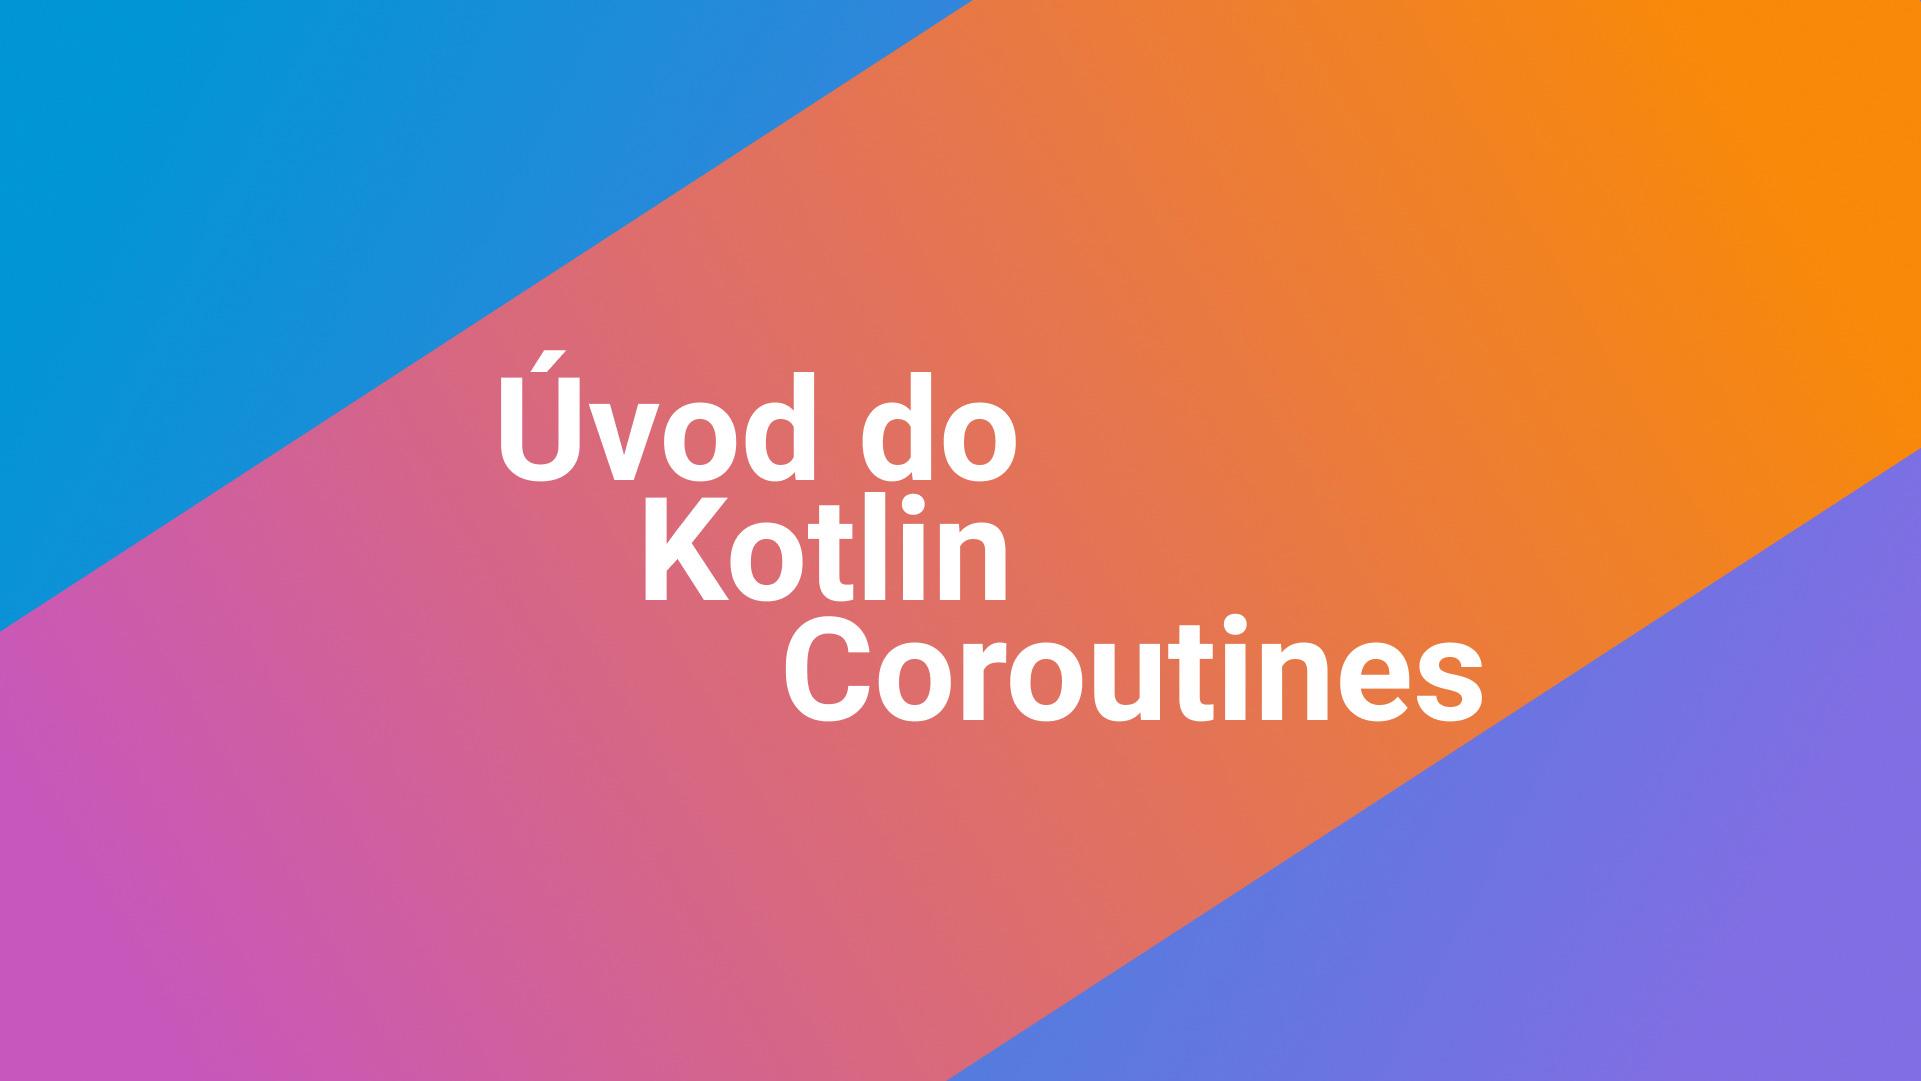 Úvod do Kotlin Coroutines